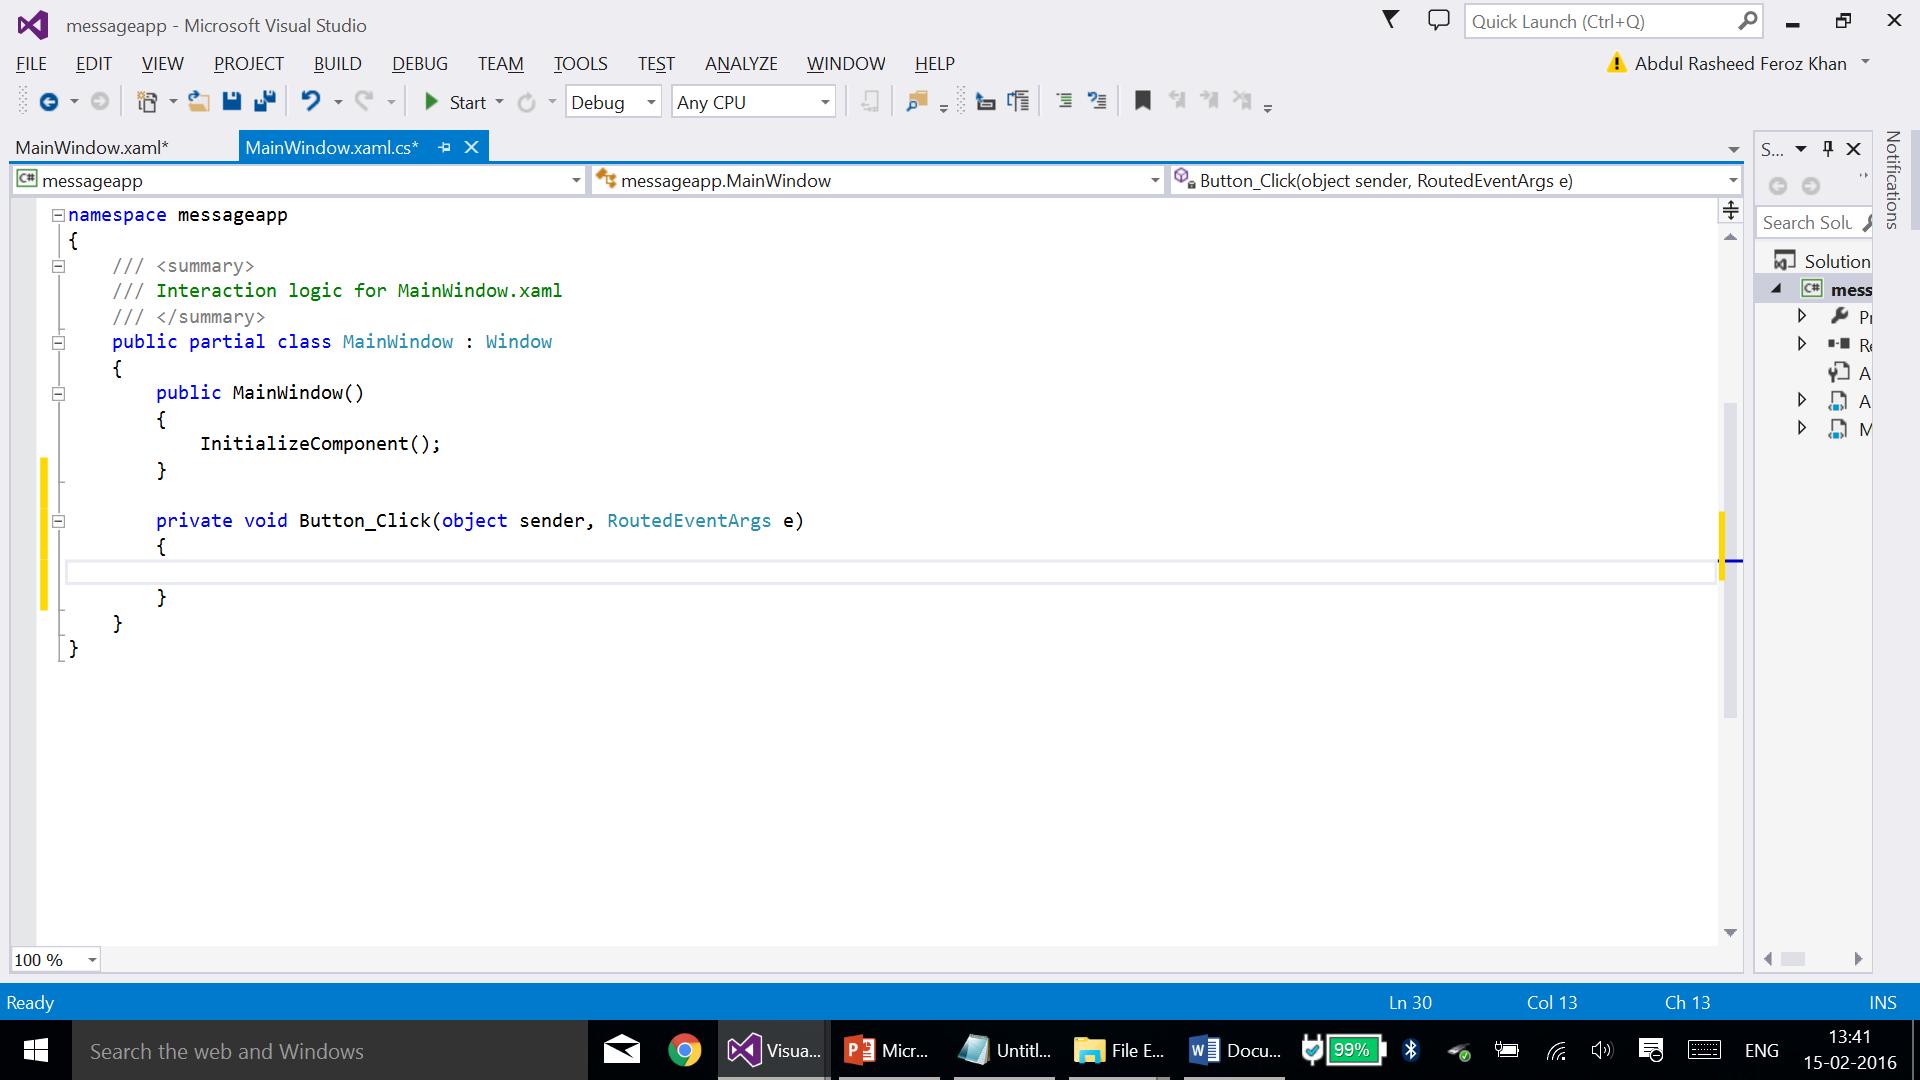 WPF: Creating a message pop-up window - TechNet Articles